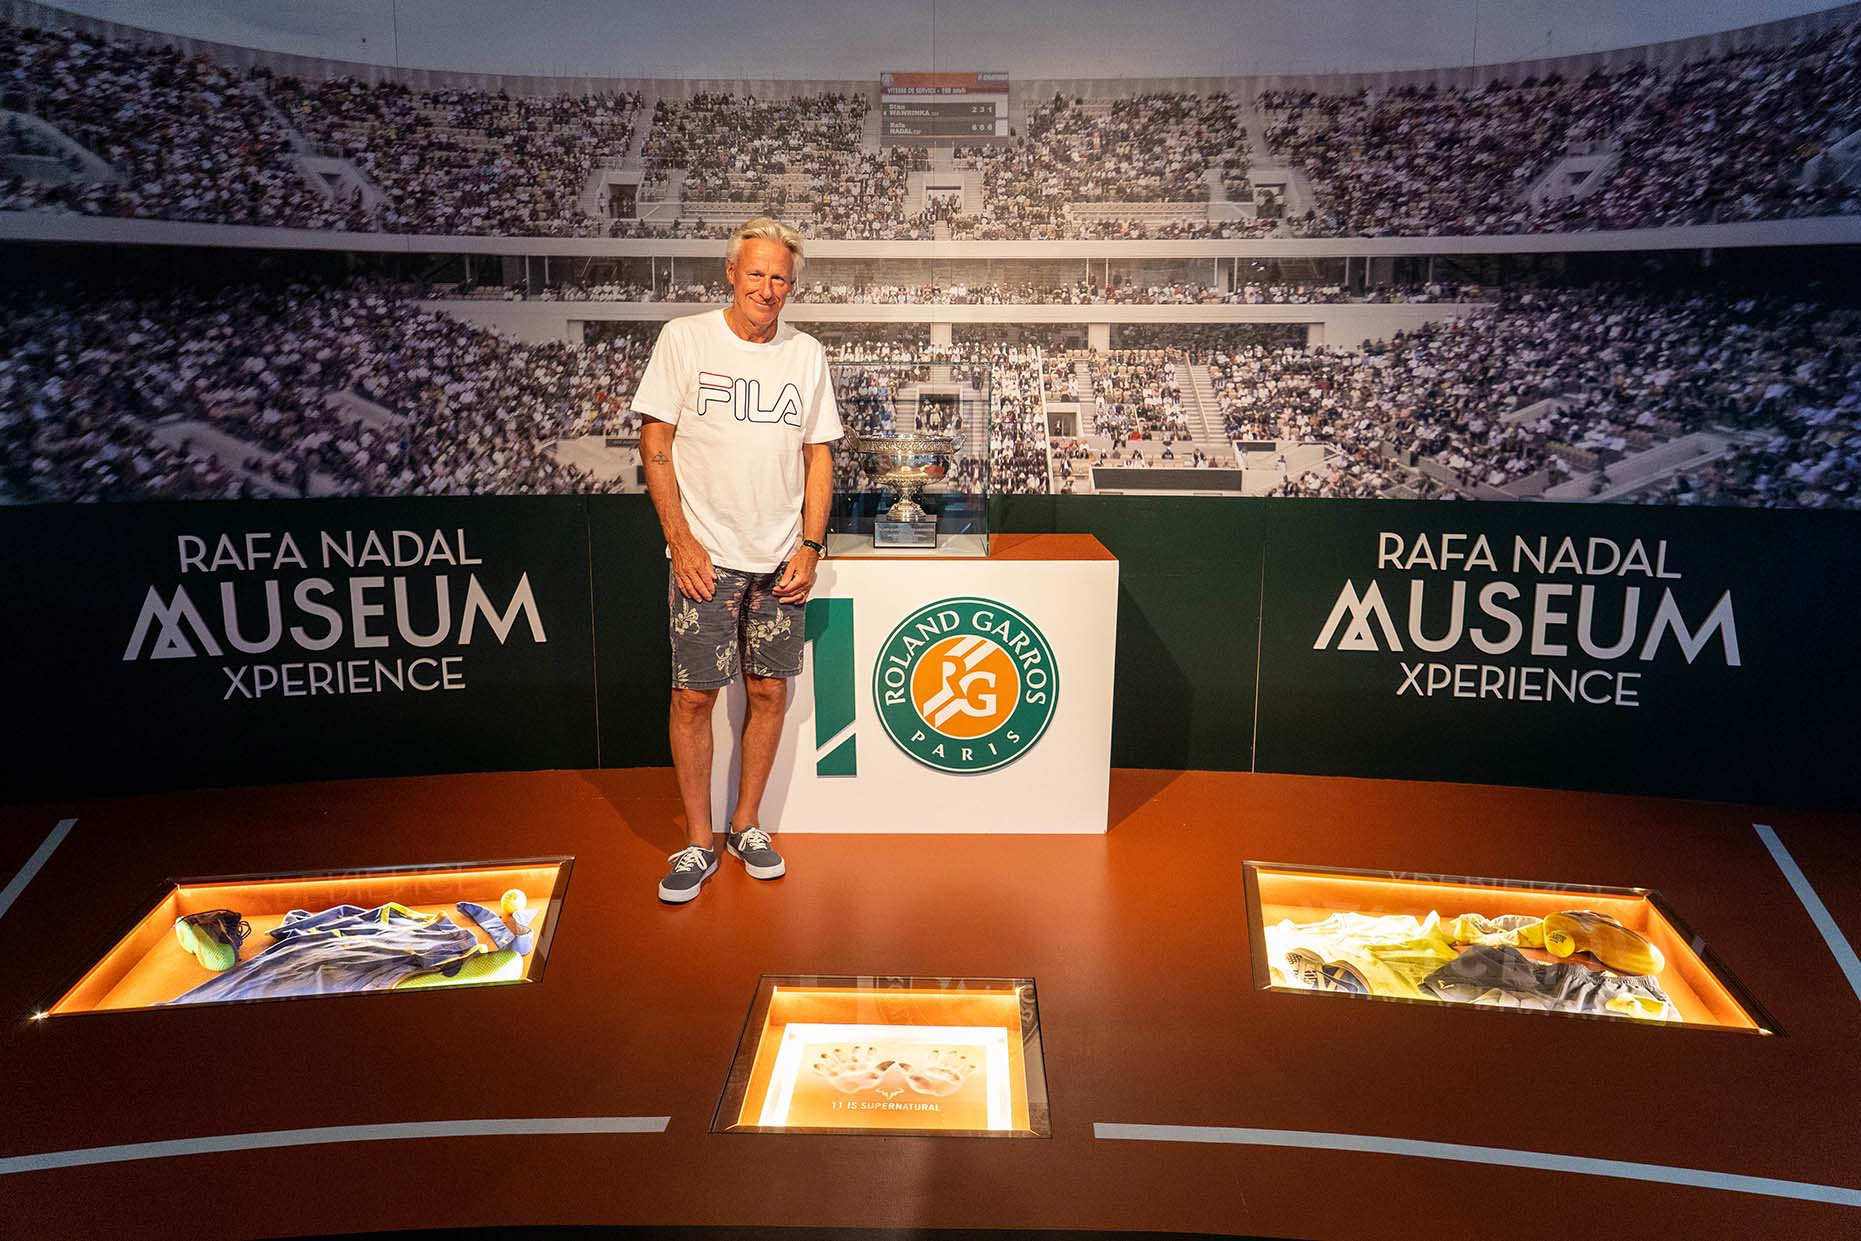 Björn Borg visits the Rafa Nadal Academy by Movistar